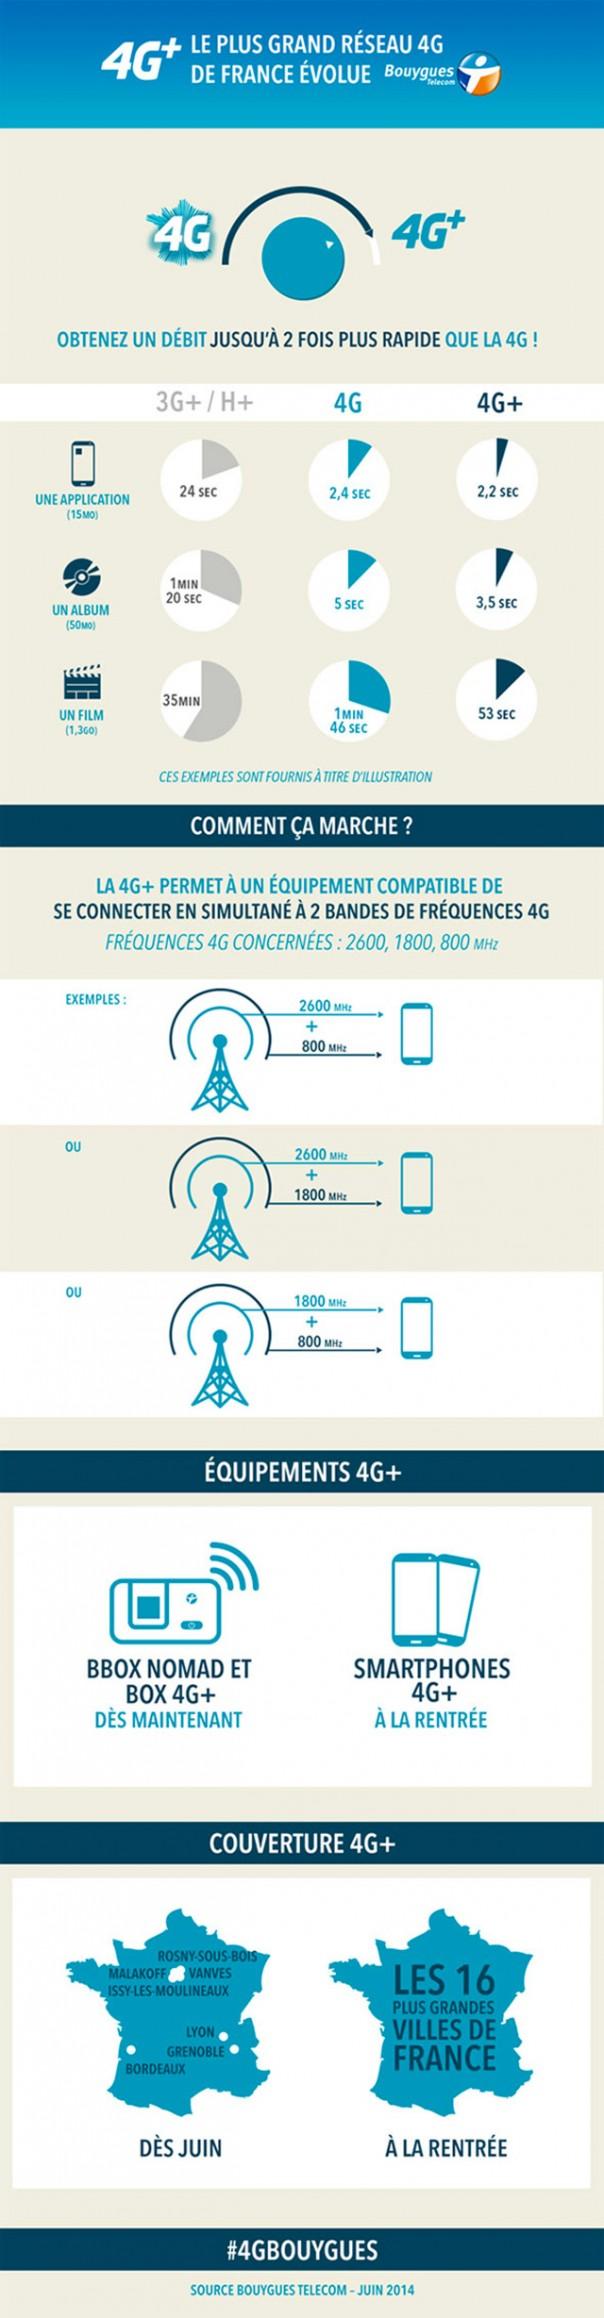 Bouygues Telecom : 4G+